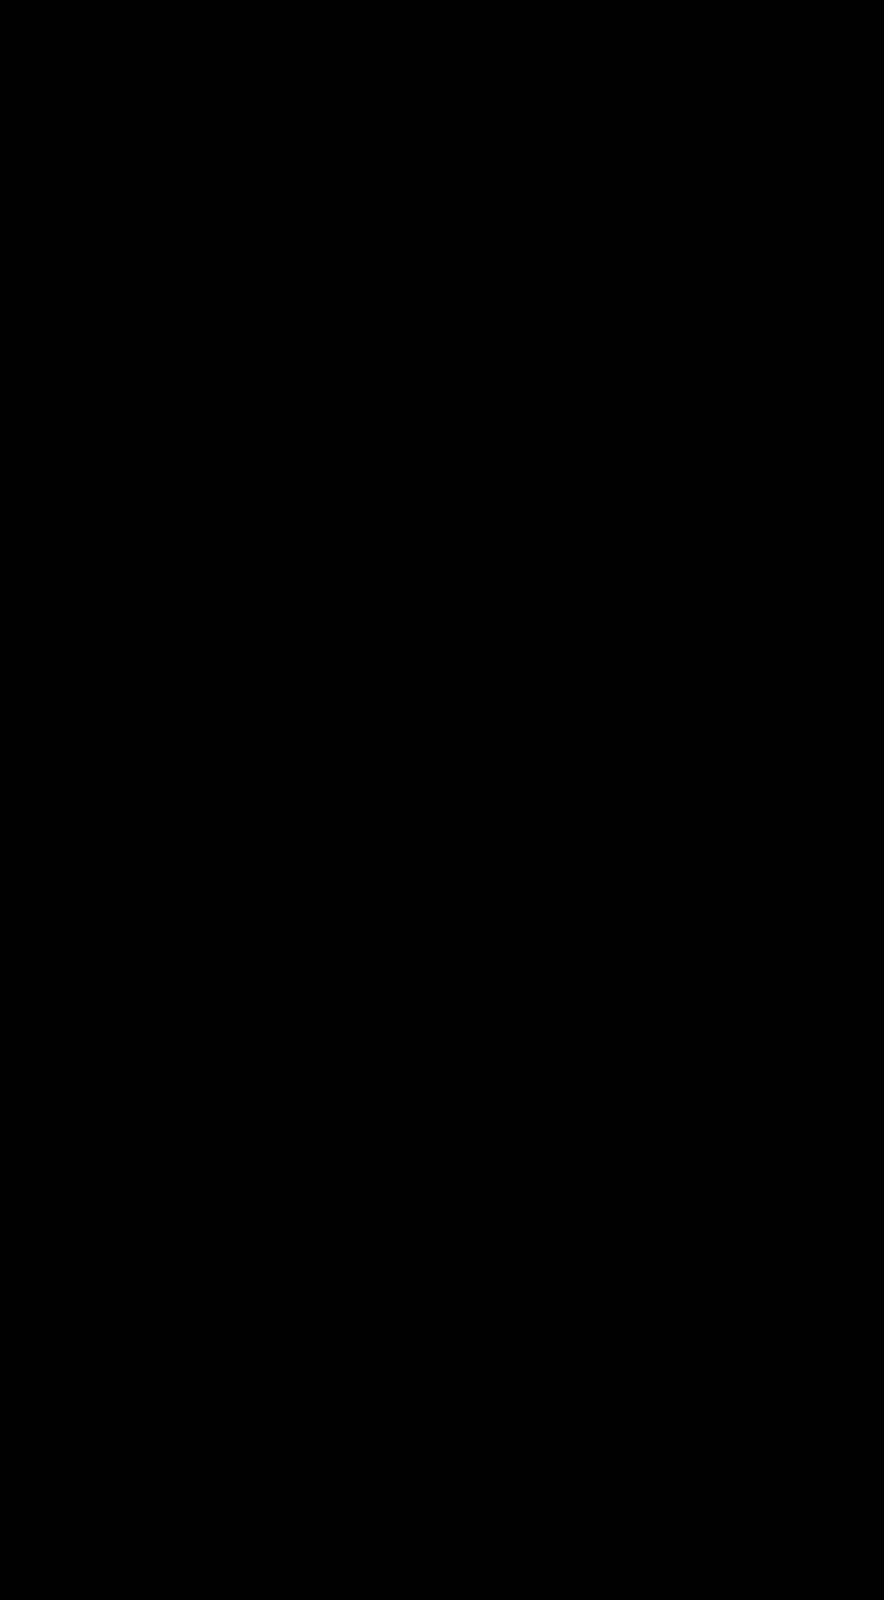 Ganpati clipart image1 in 2019.